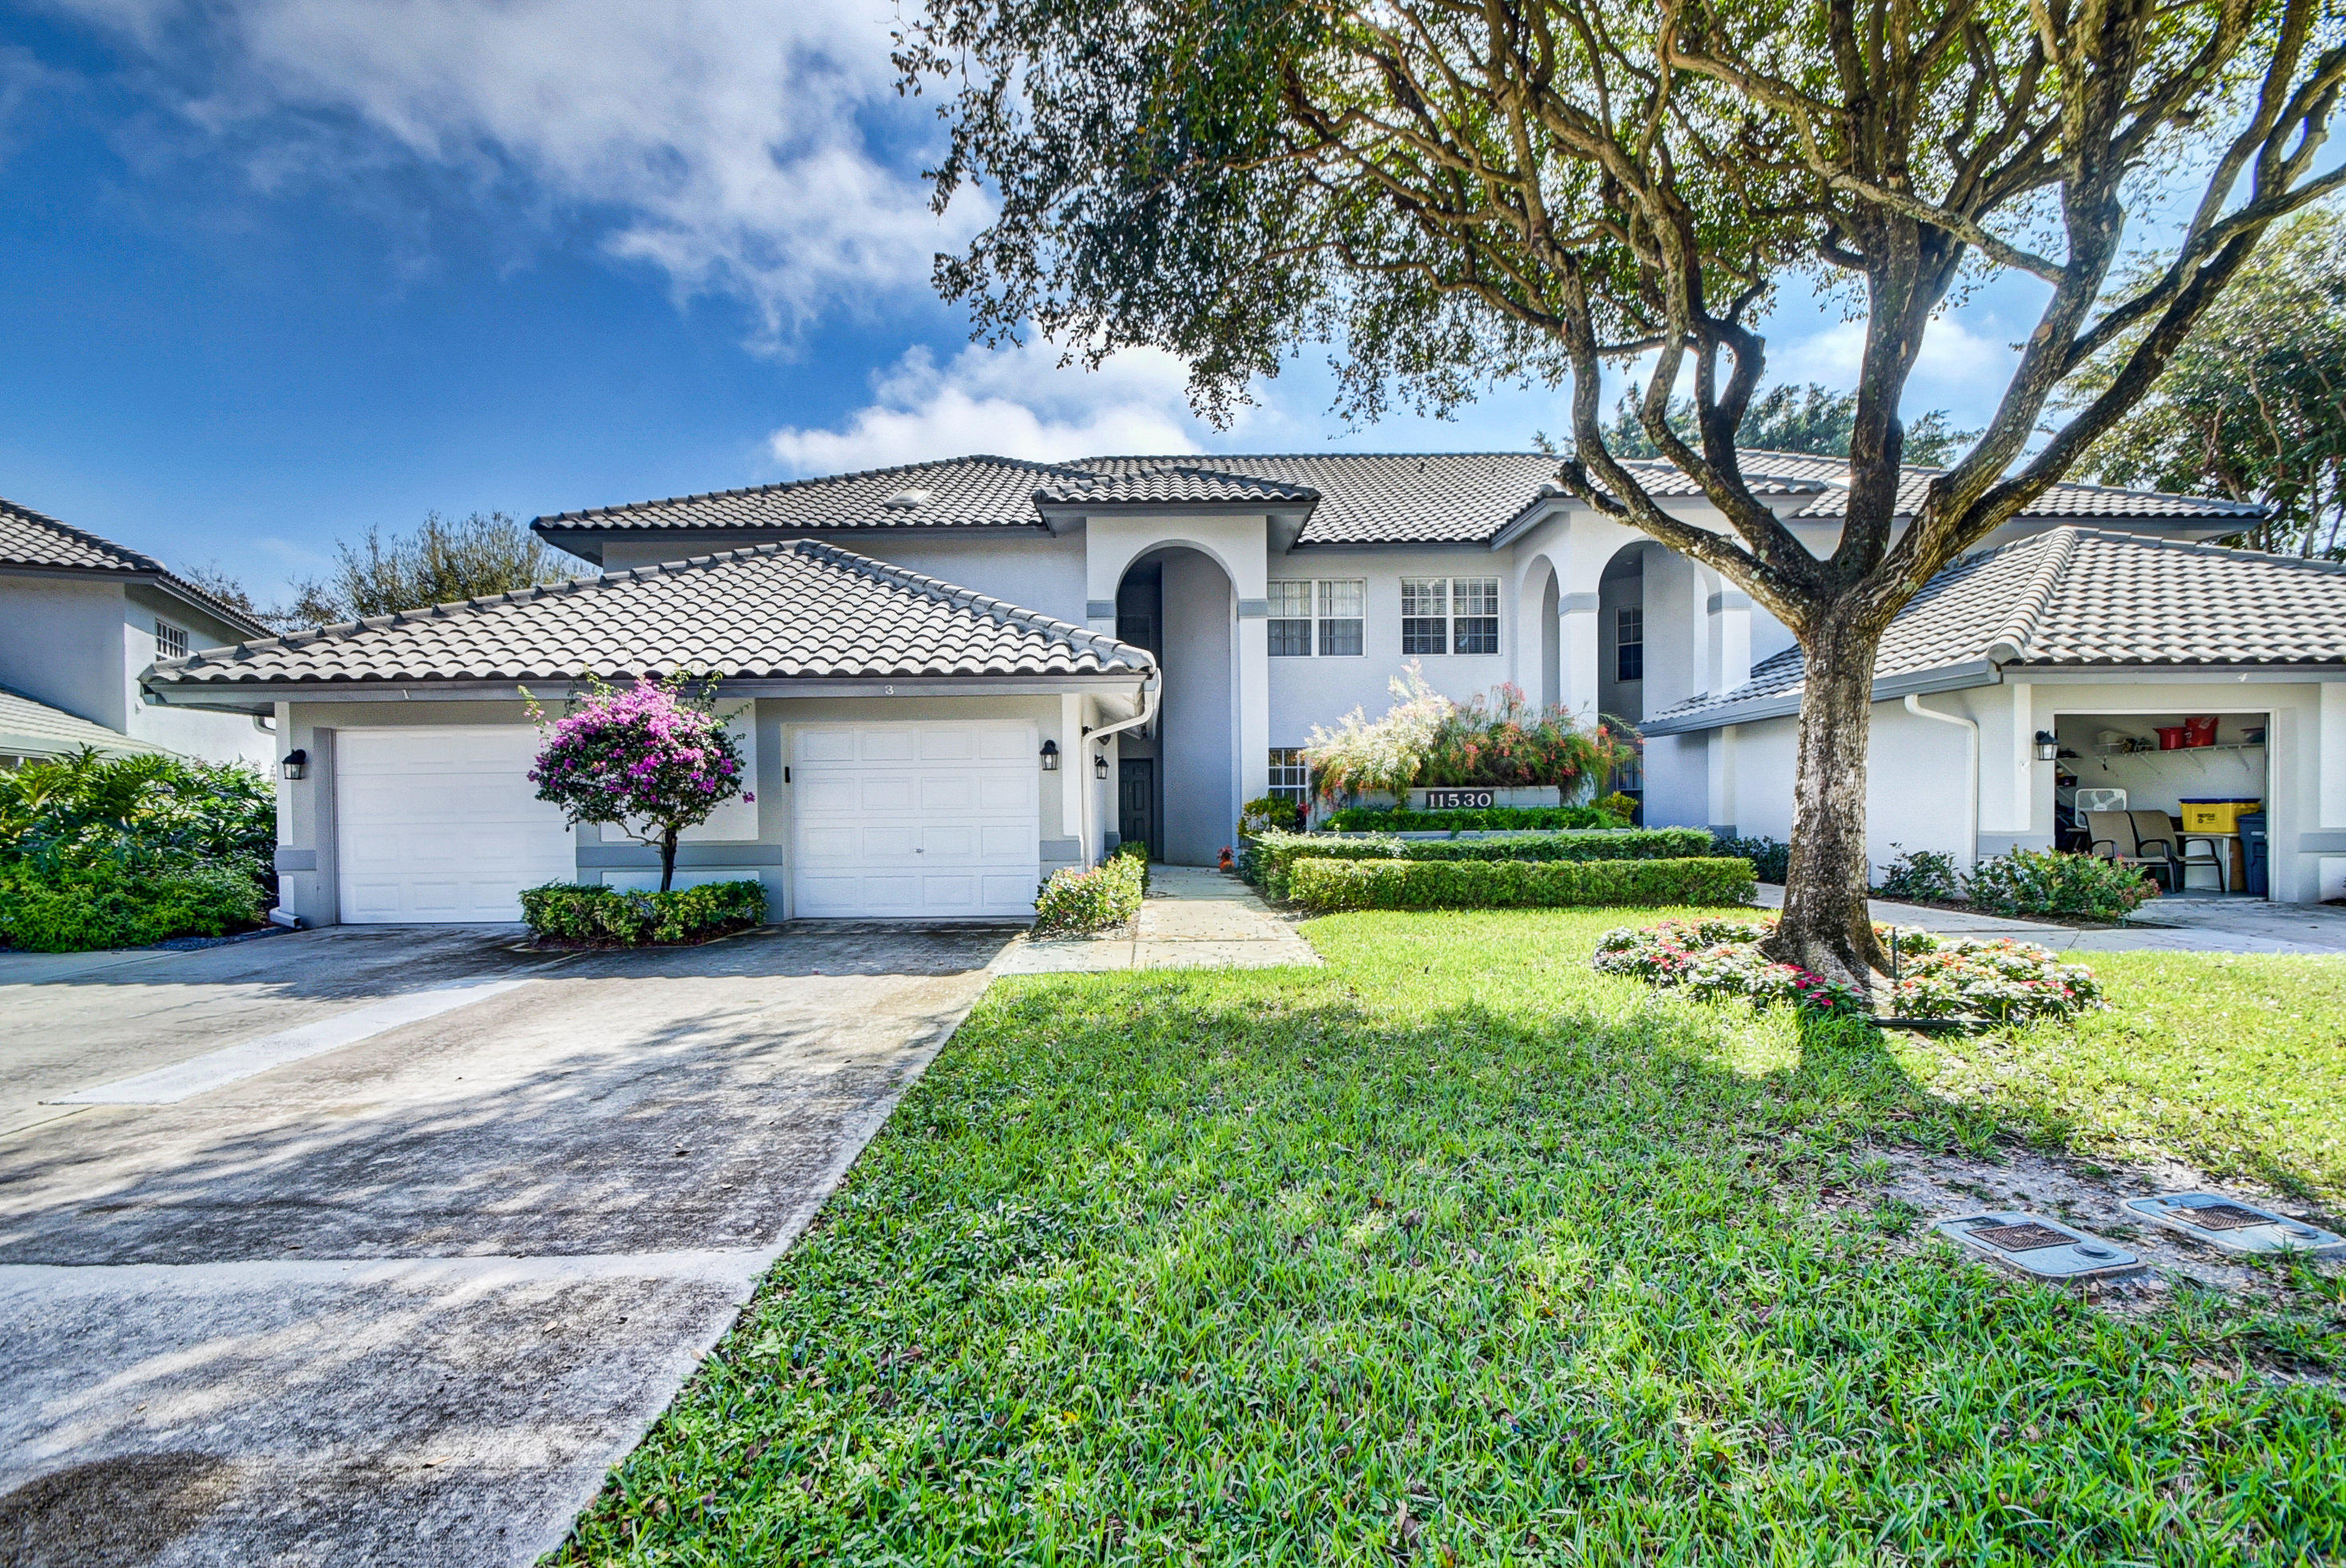 Photo of 11530 Briarwood Circle #1, Boynton Beach, FL 33437